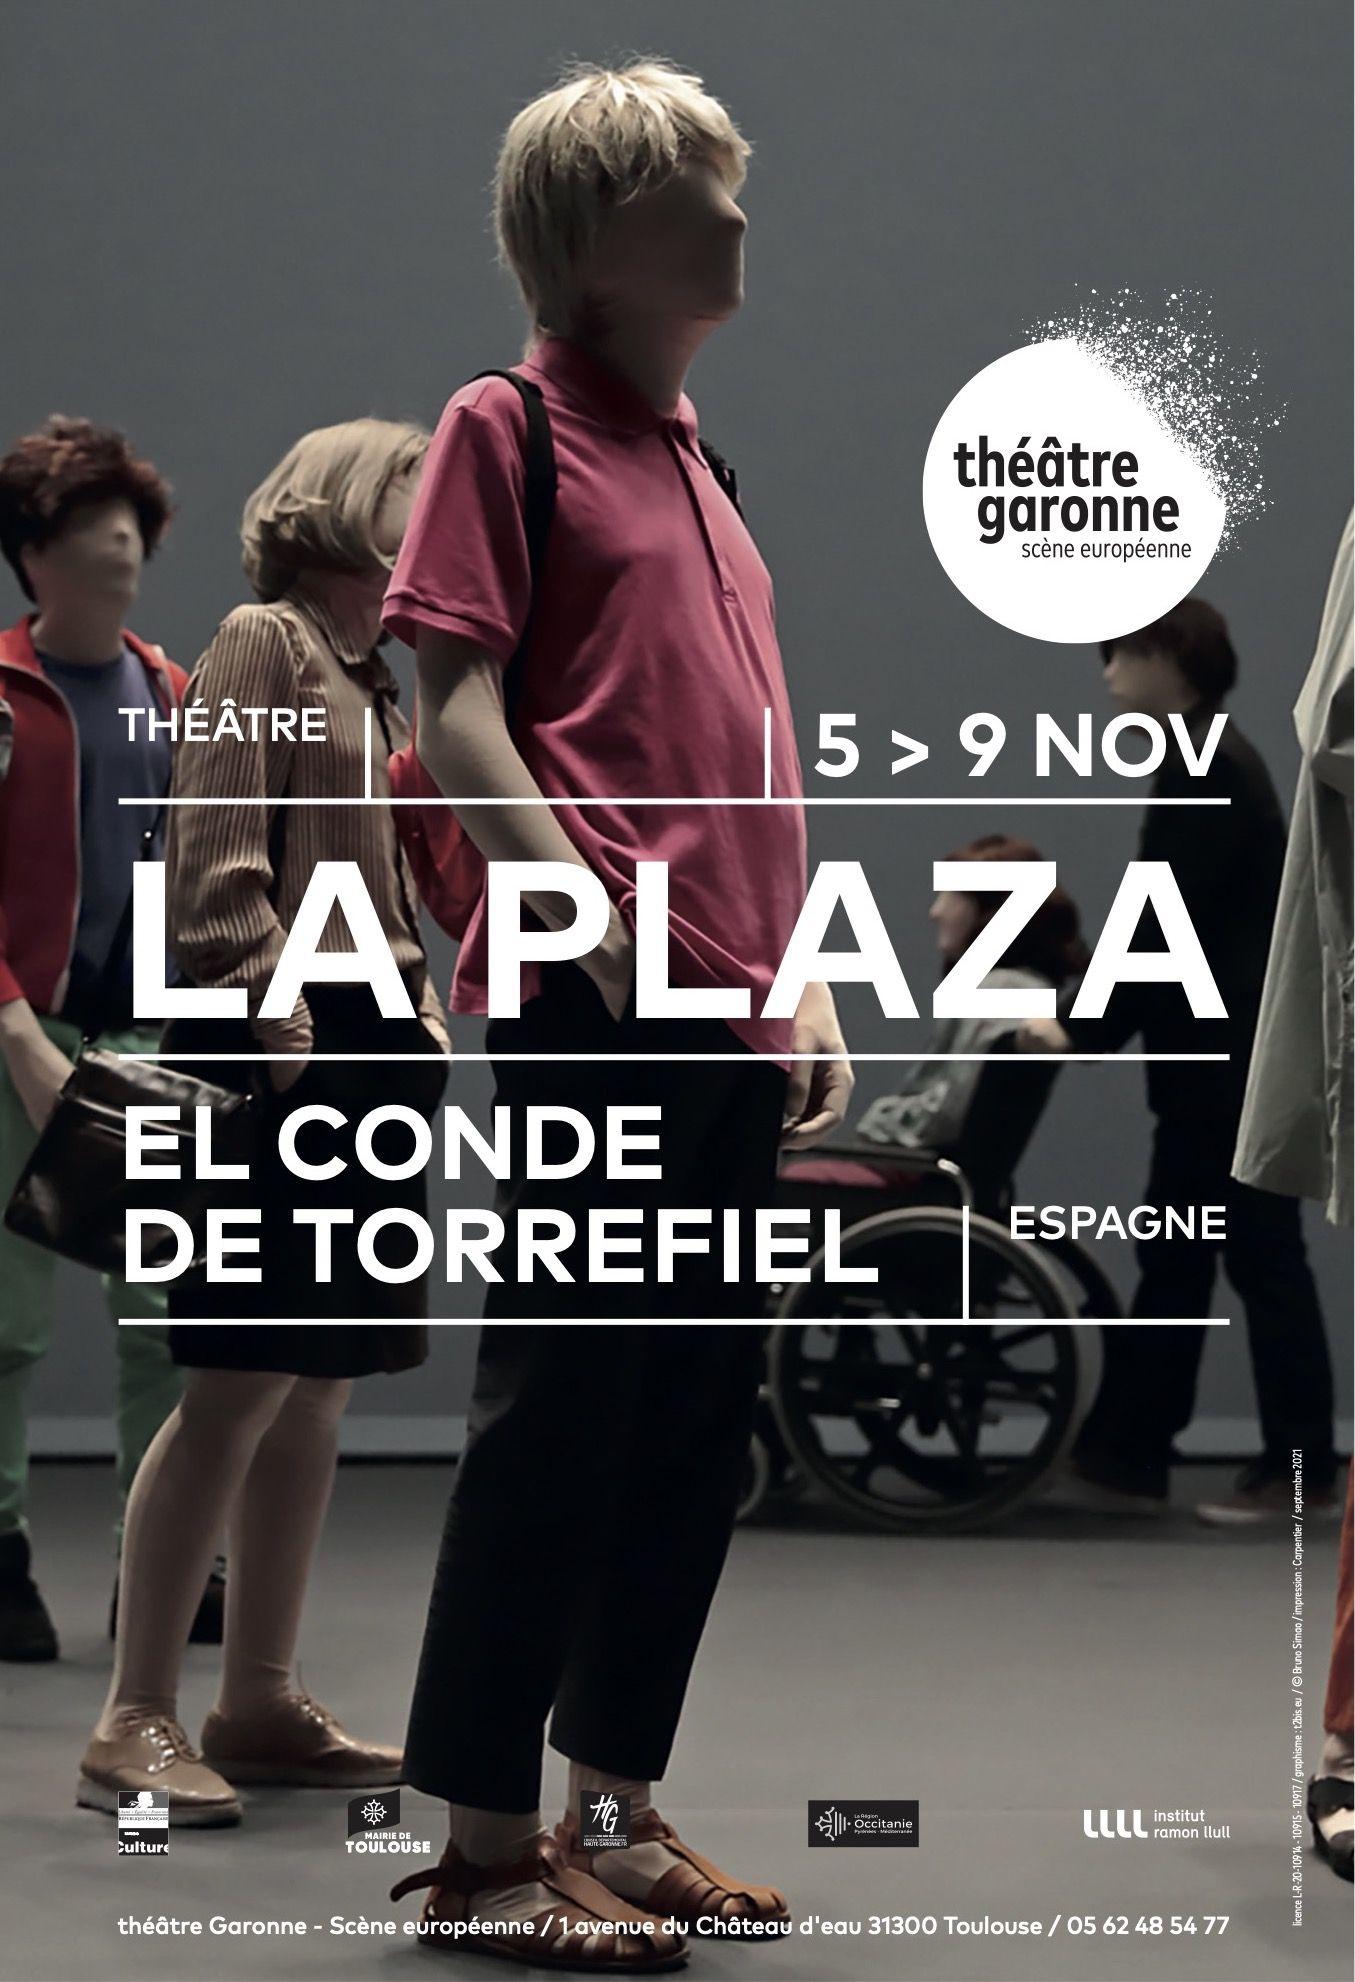 Théâtre Garonne - La Plaza